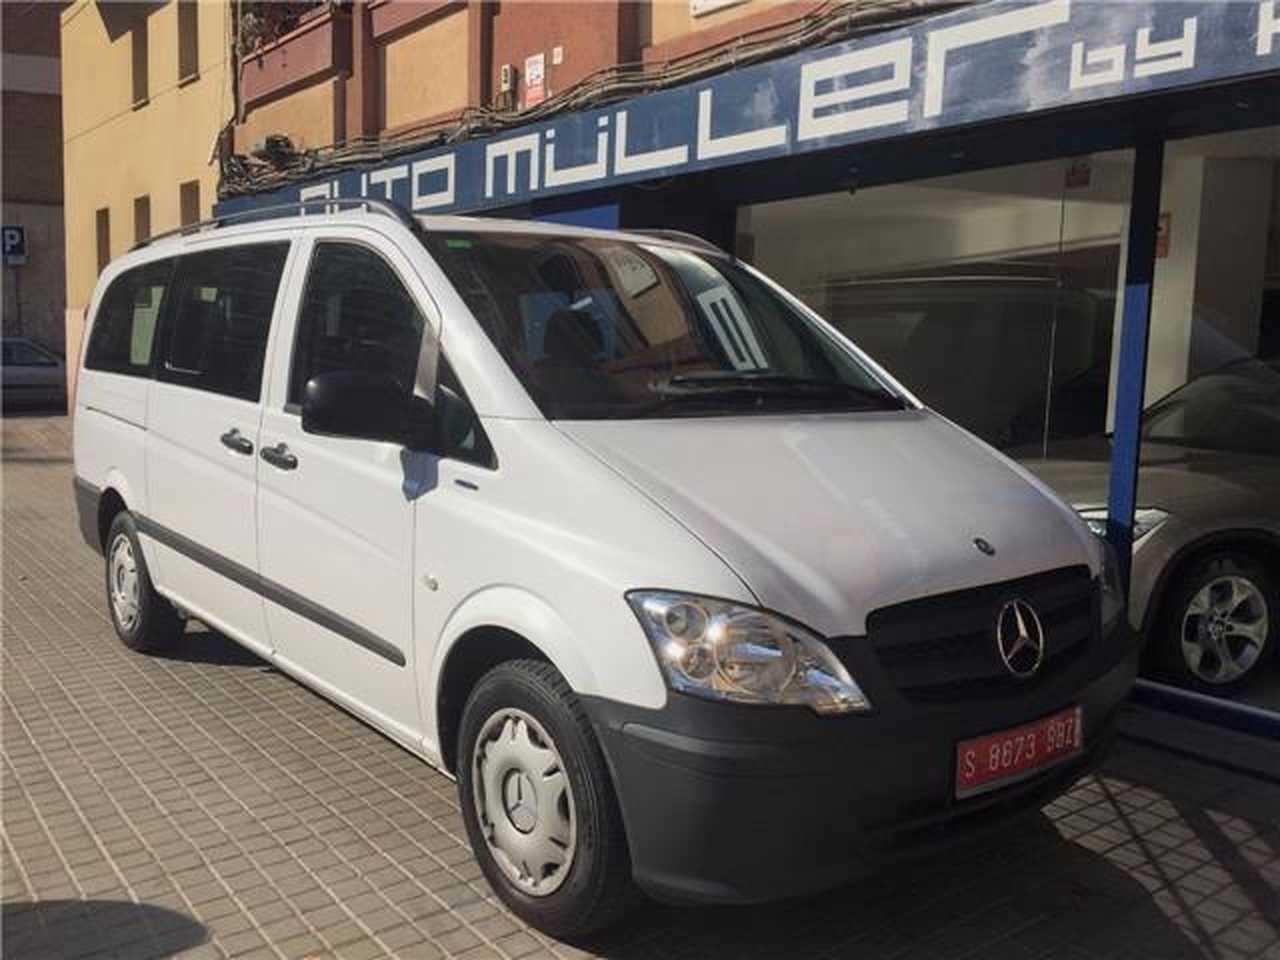 Mercedes Vito 113 CDI Larga  9 Plazas / Automática  - Foto 1